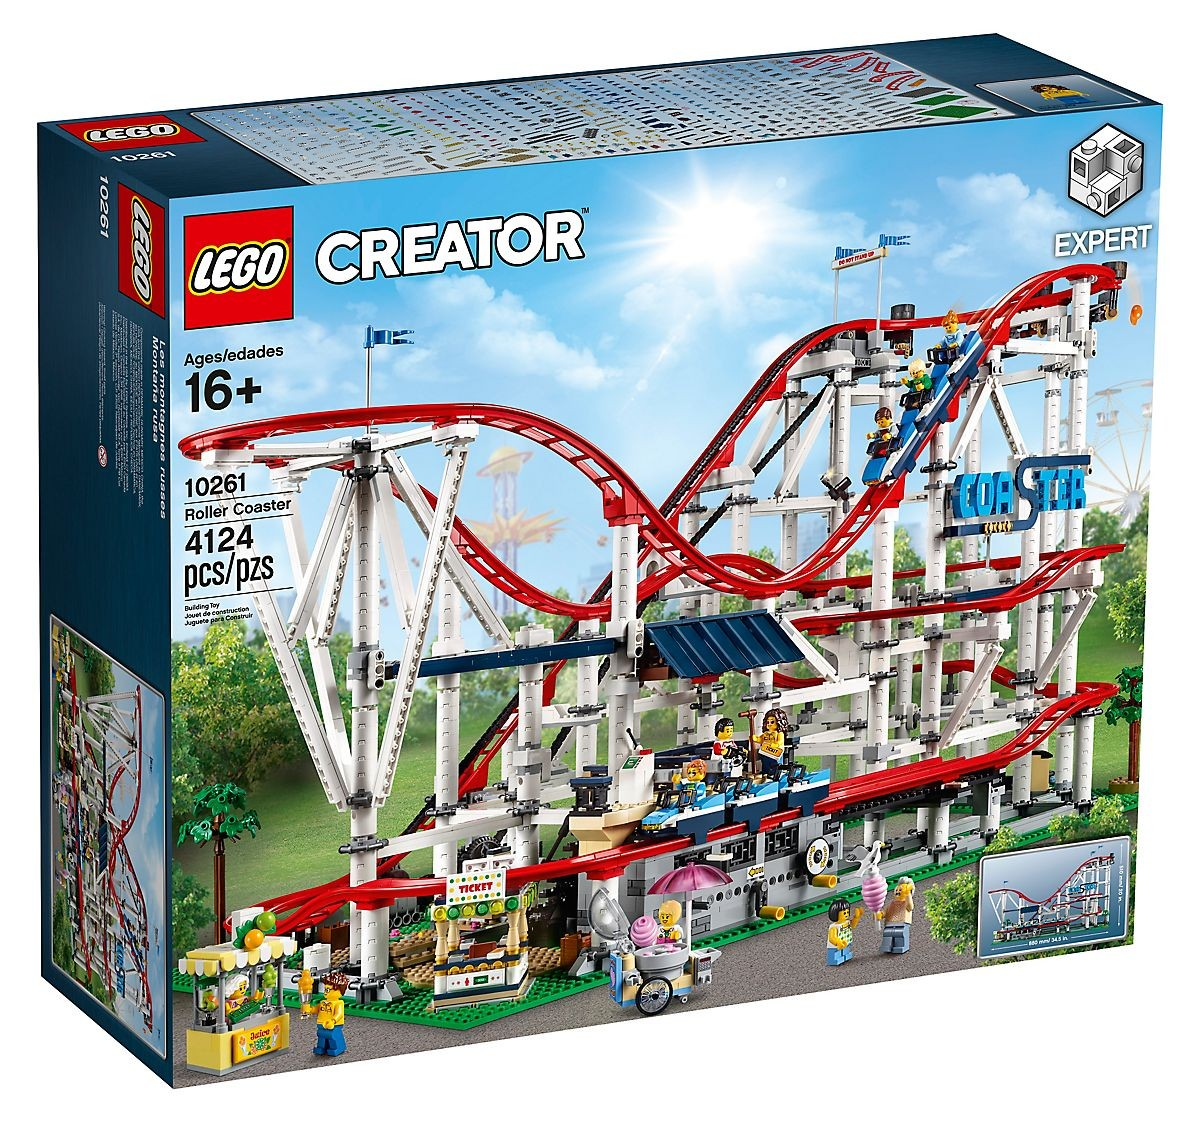 Lego Creator Exclusive 10261 Kolejka Górska Super Oferty Na Klocki Lego